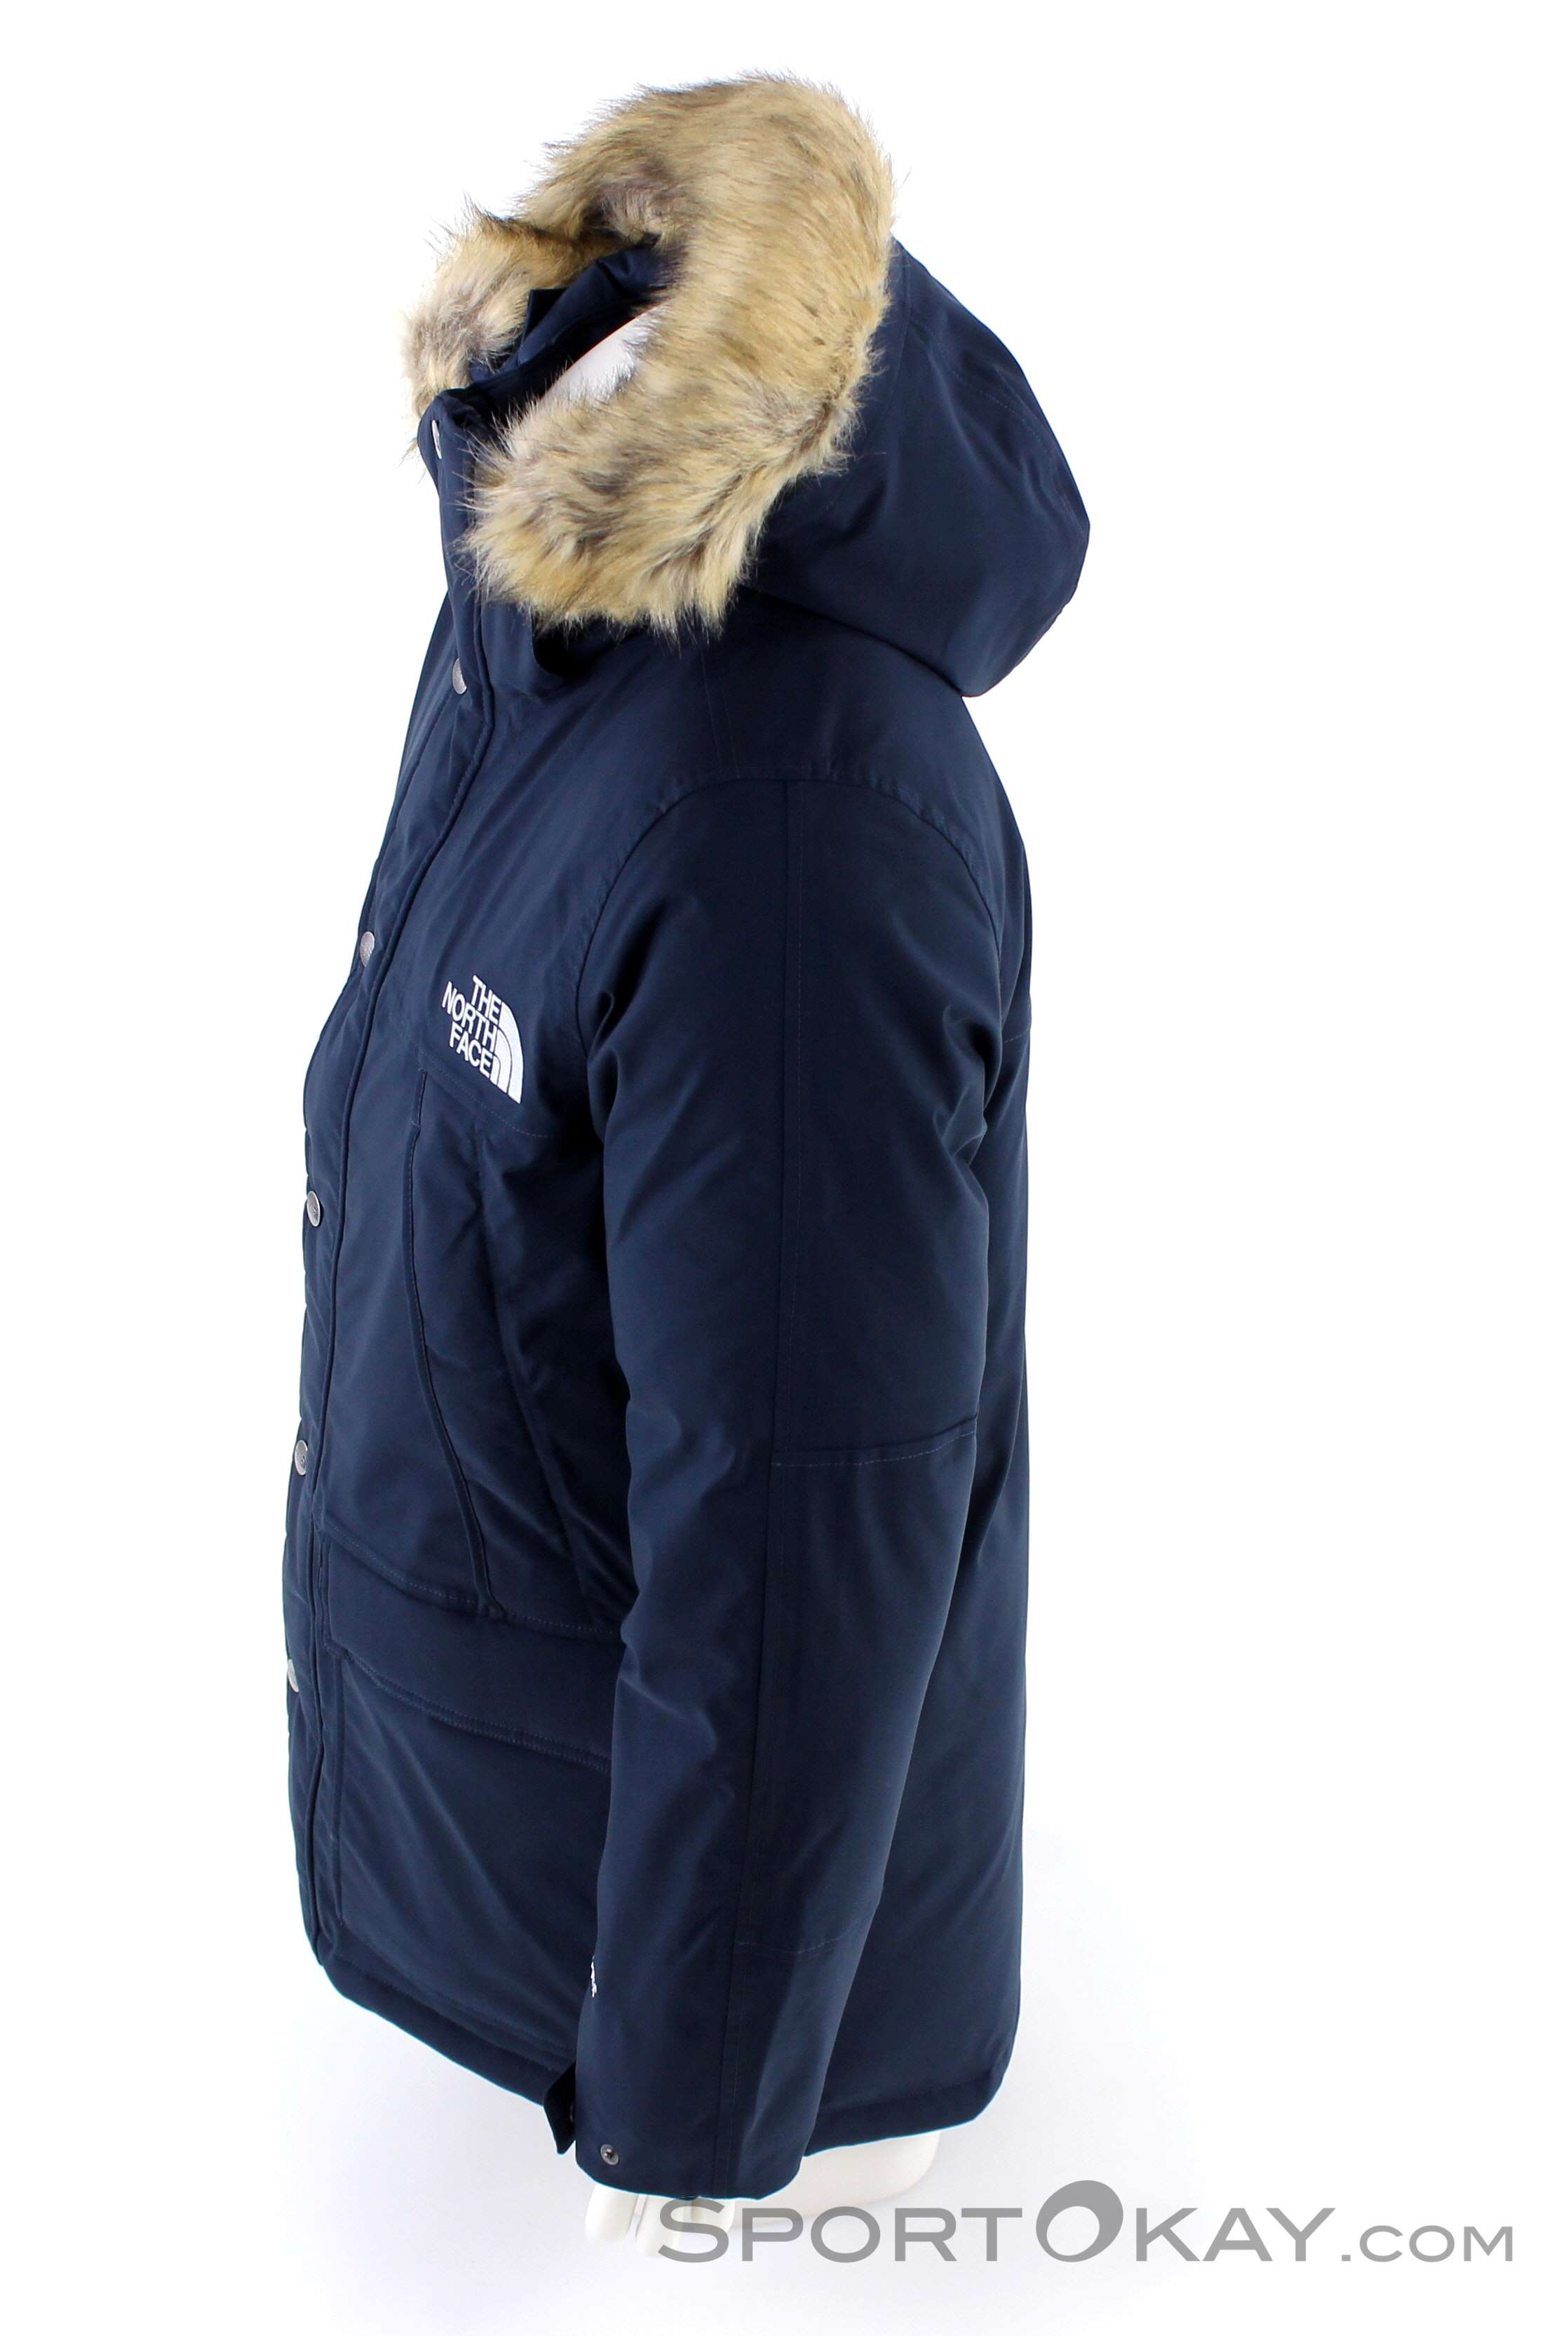 3c0da9ce7 The North Face The North Face Mountain Murdo GTX Mens Ski Jacket Gore-Tex